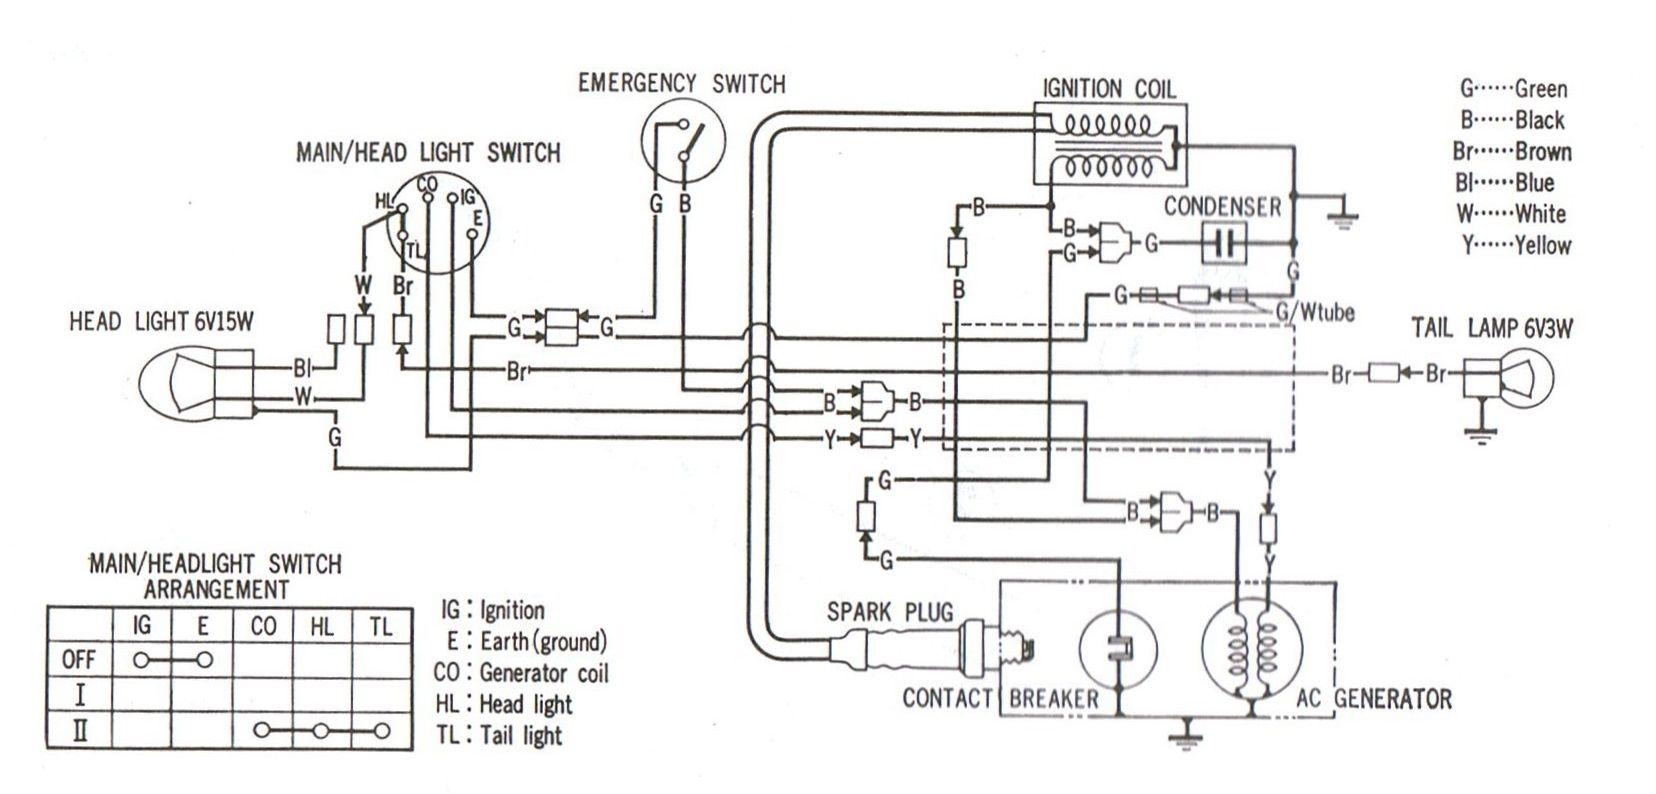 ct90 wiring diagram ee 3371  honda wiring diagram moreover honda ct90 wiring diagram 1970 ct90 wiring diagram moreover honda ct90 wiring diagram